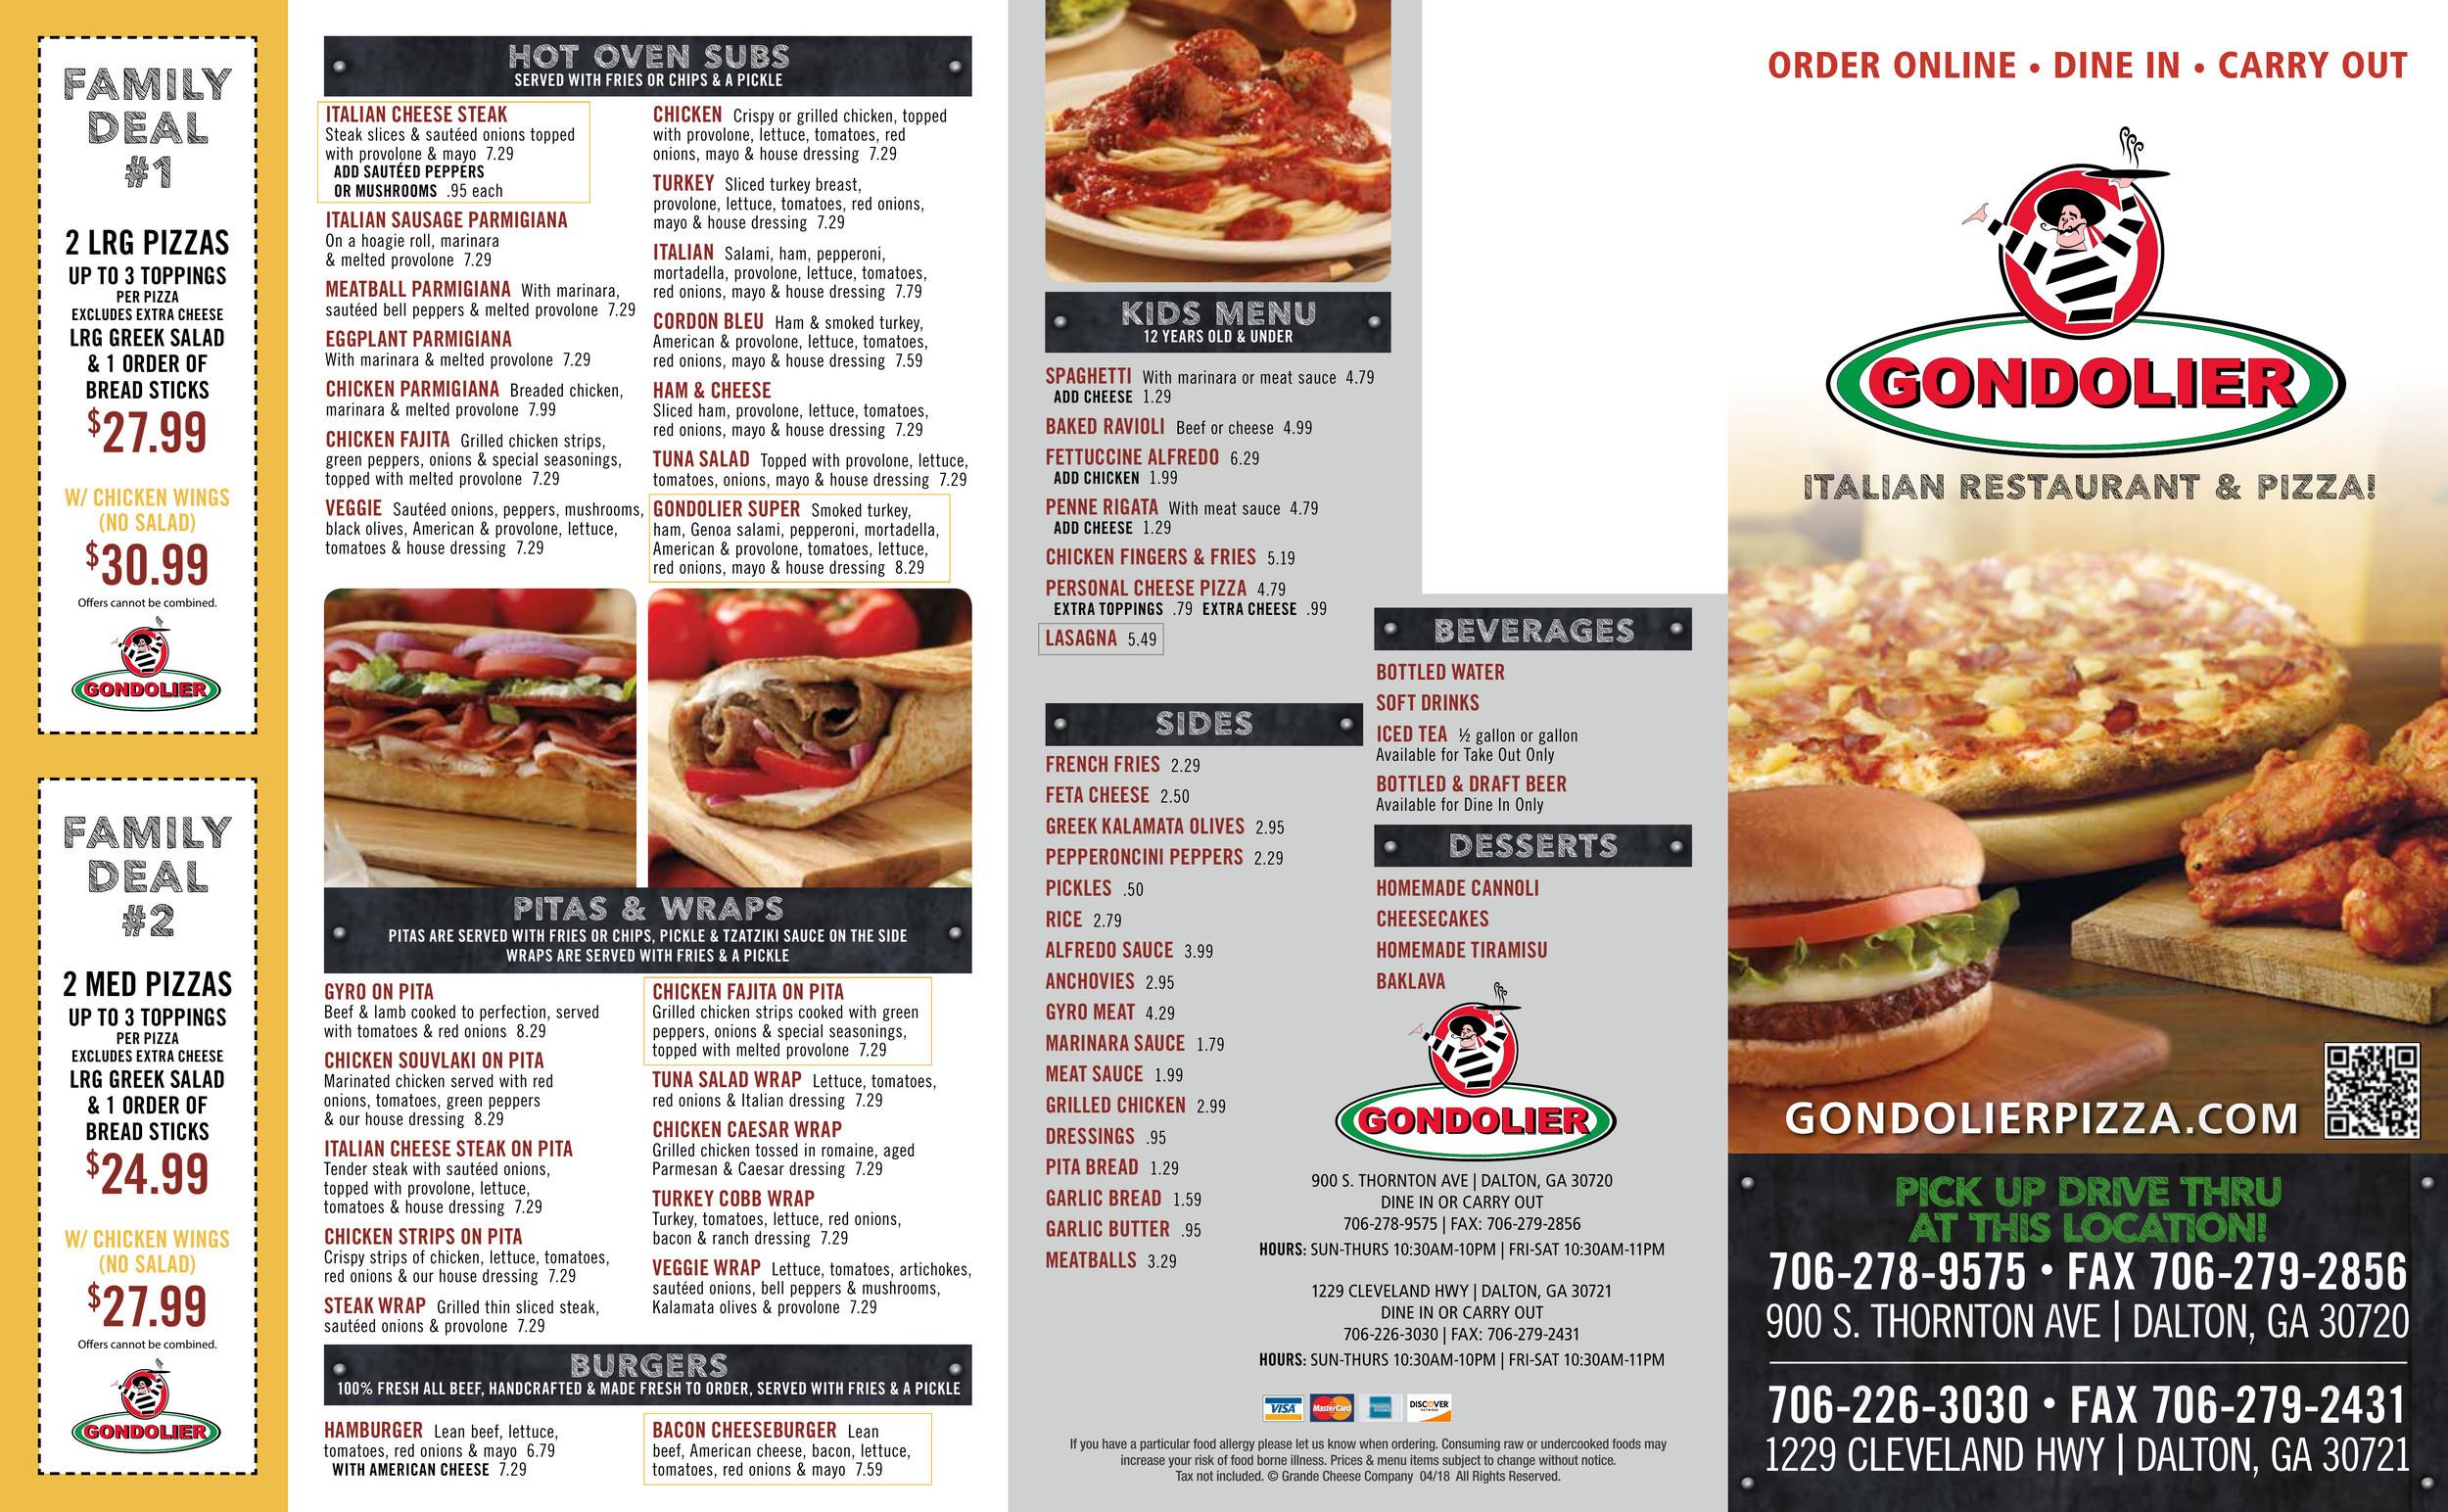 Menu for Gondolier Italian Restaurant & Pizza in Dalton, Georgia